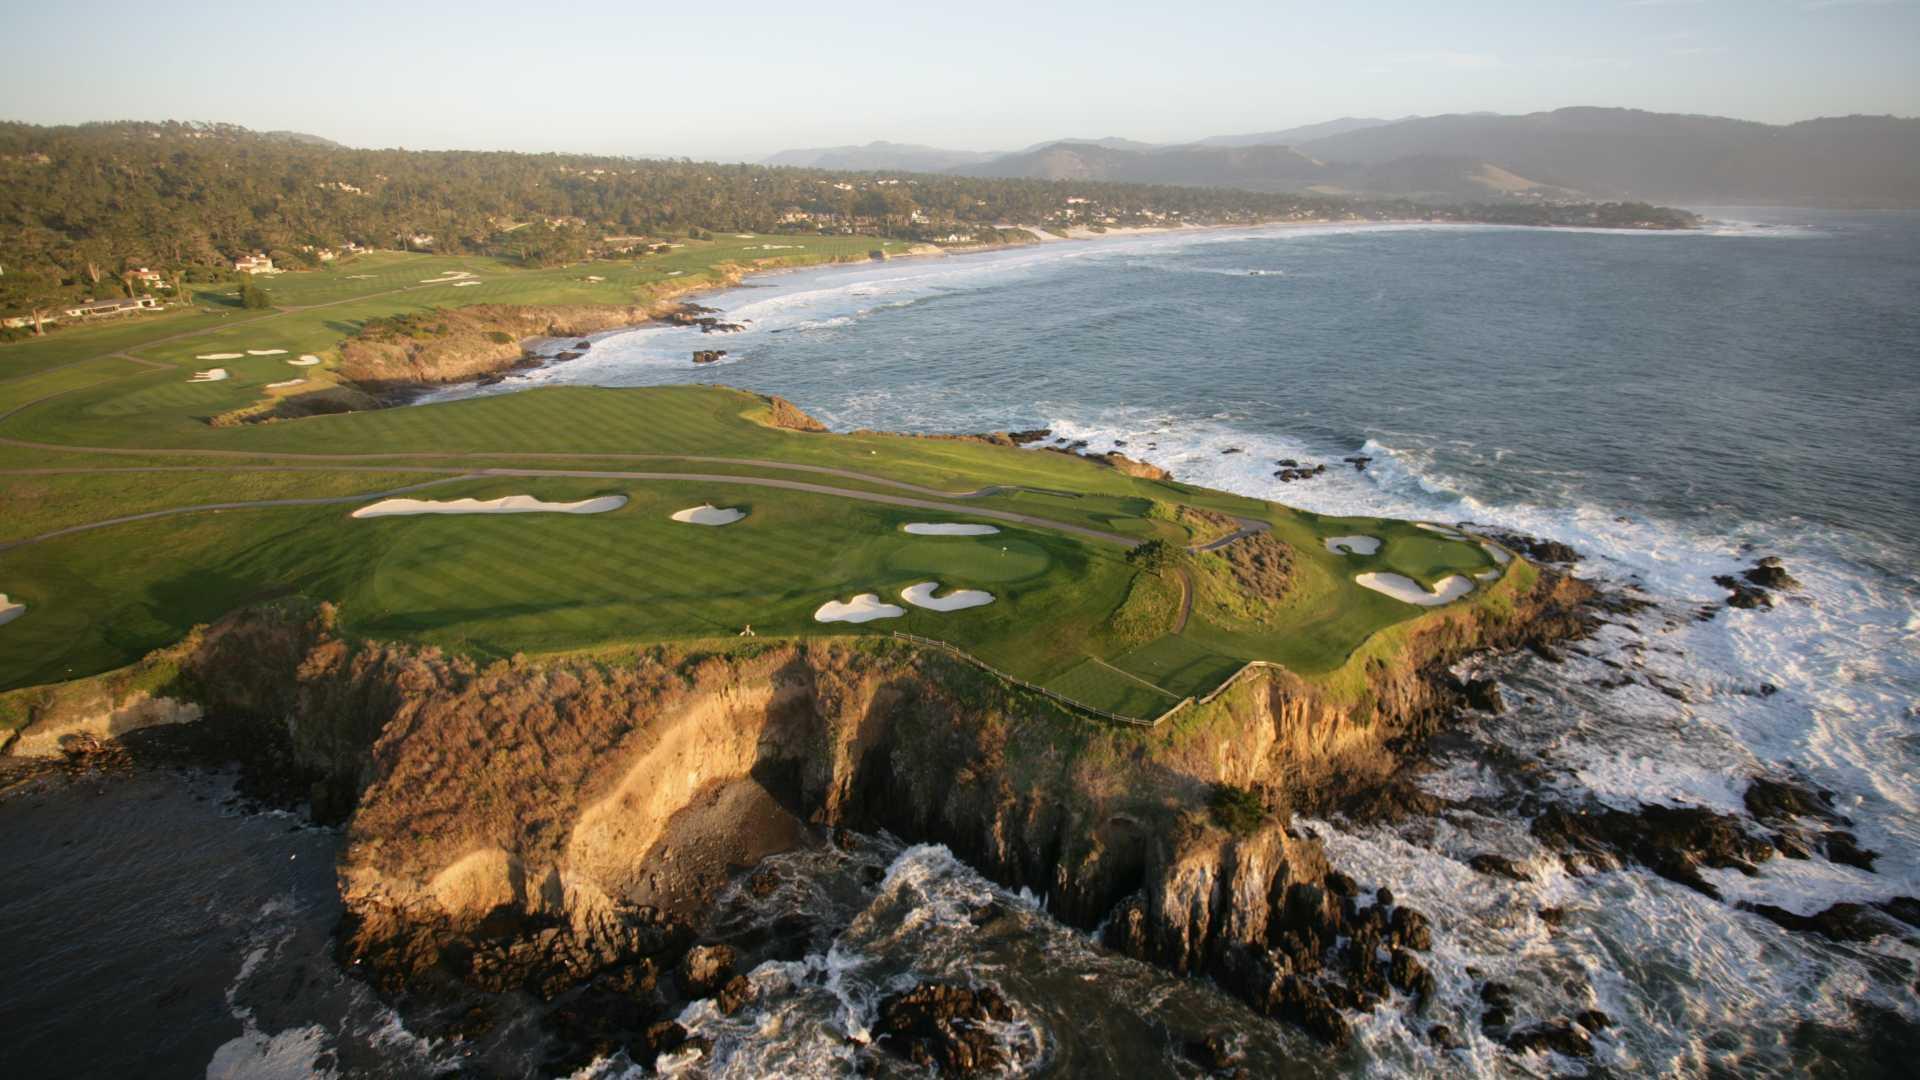 Pebble Beach golf links, Pebble Beach, United States of America